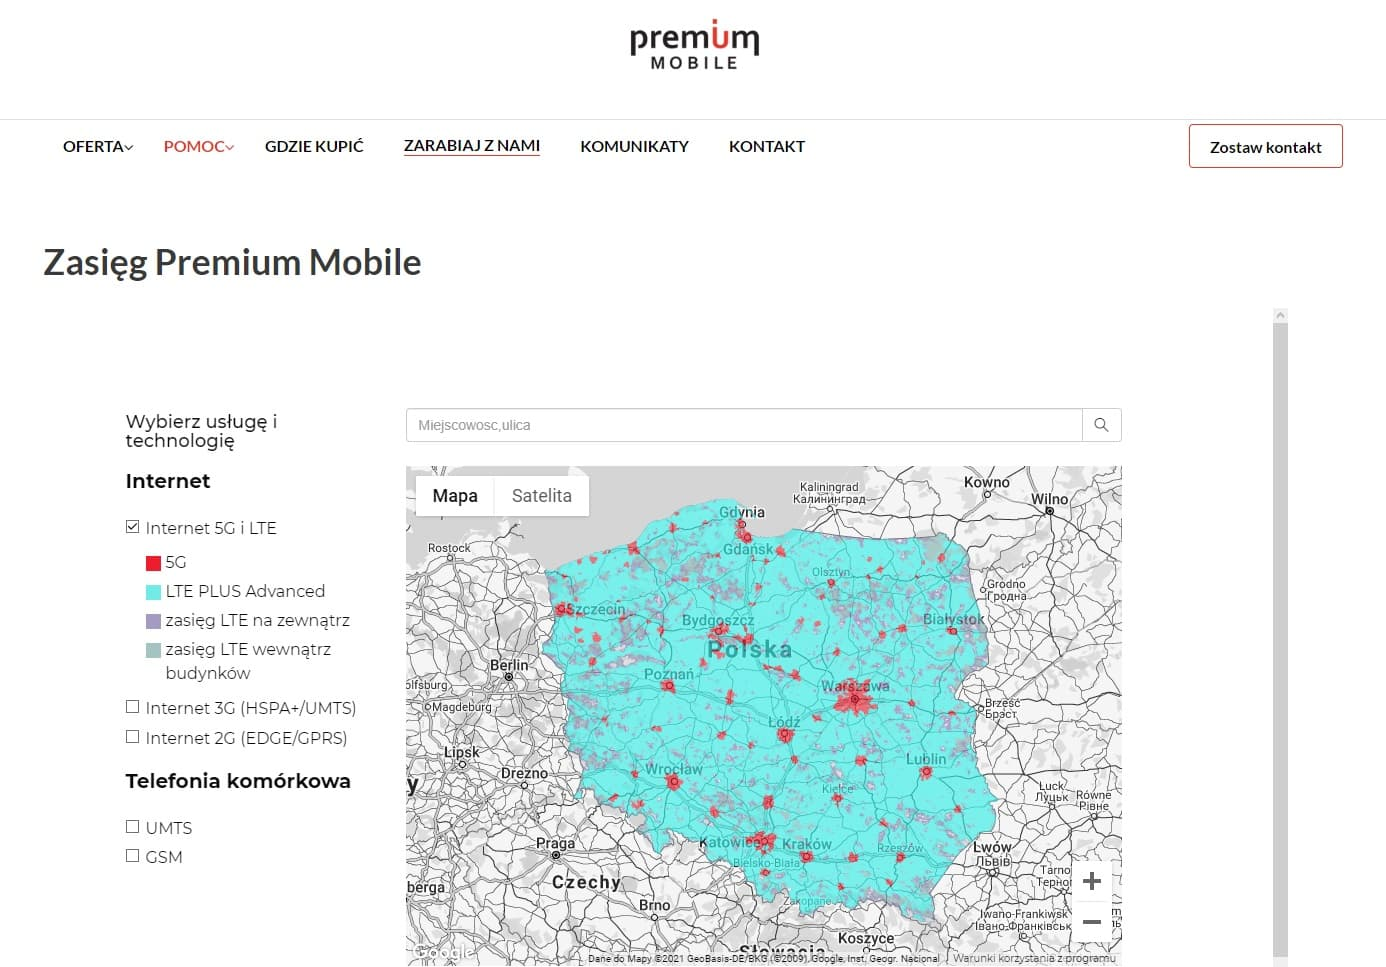 Zasięg pemium mobile